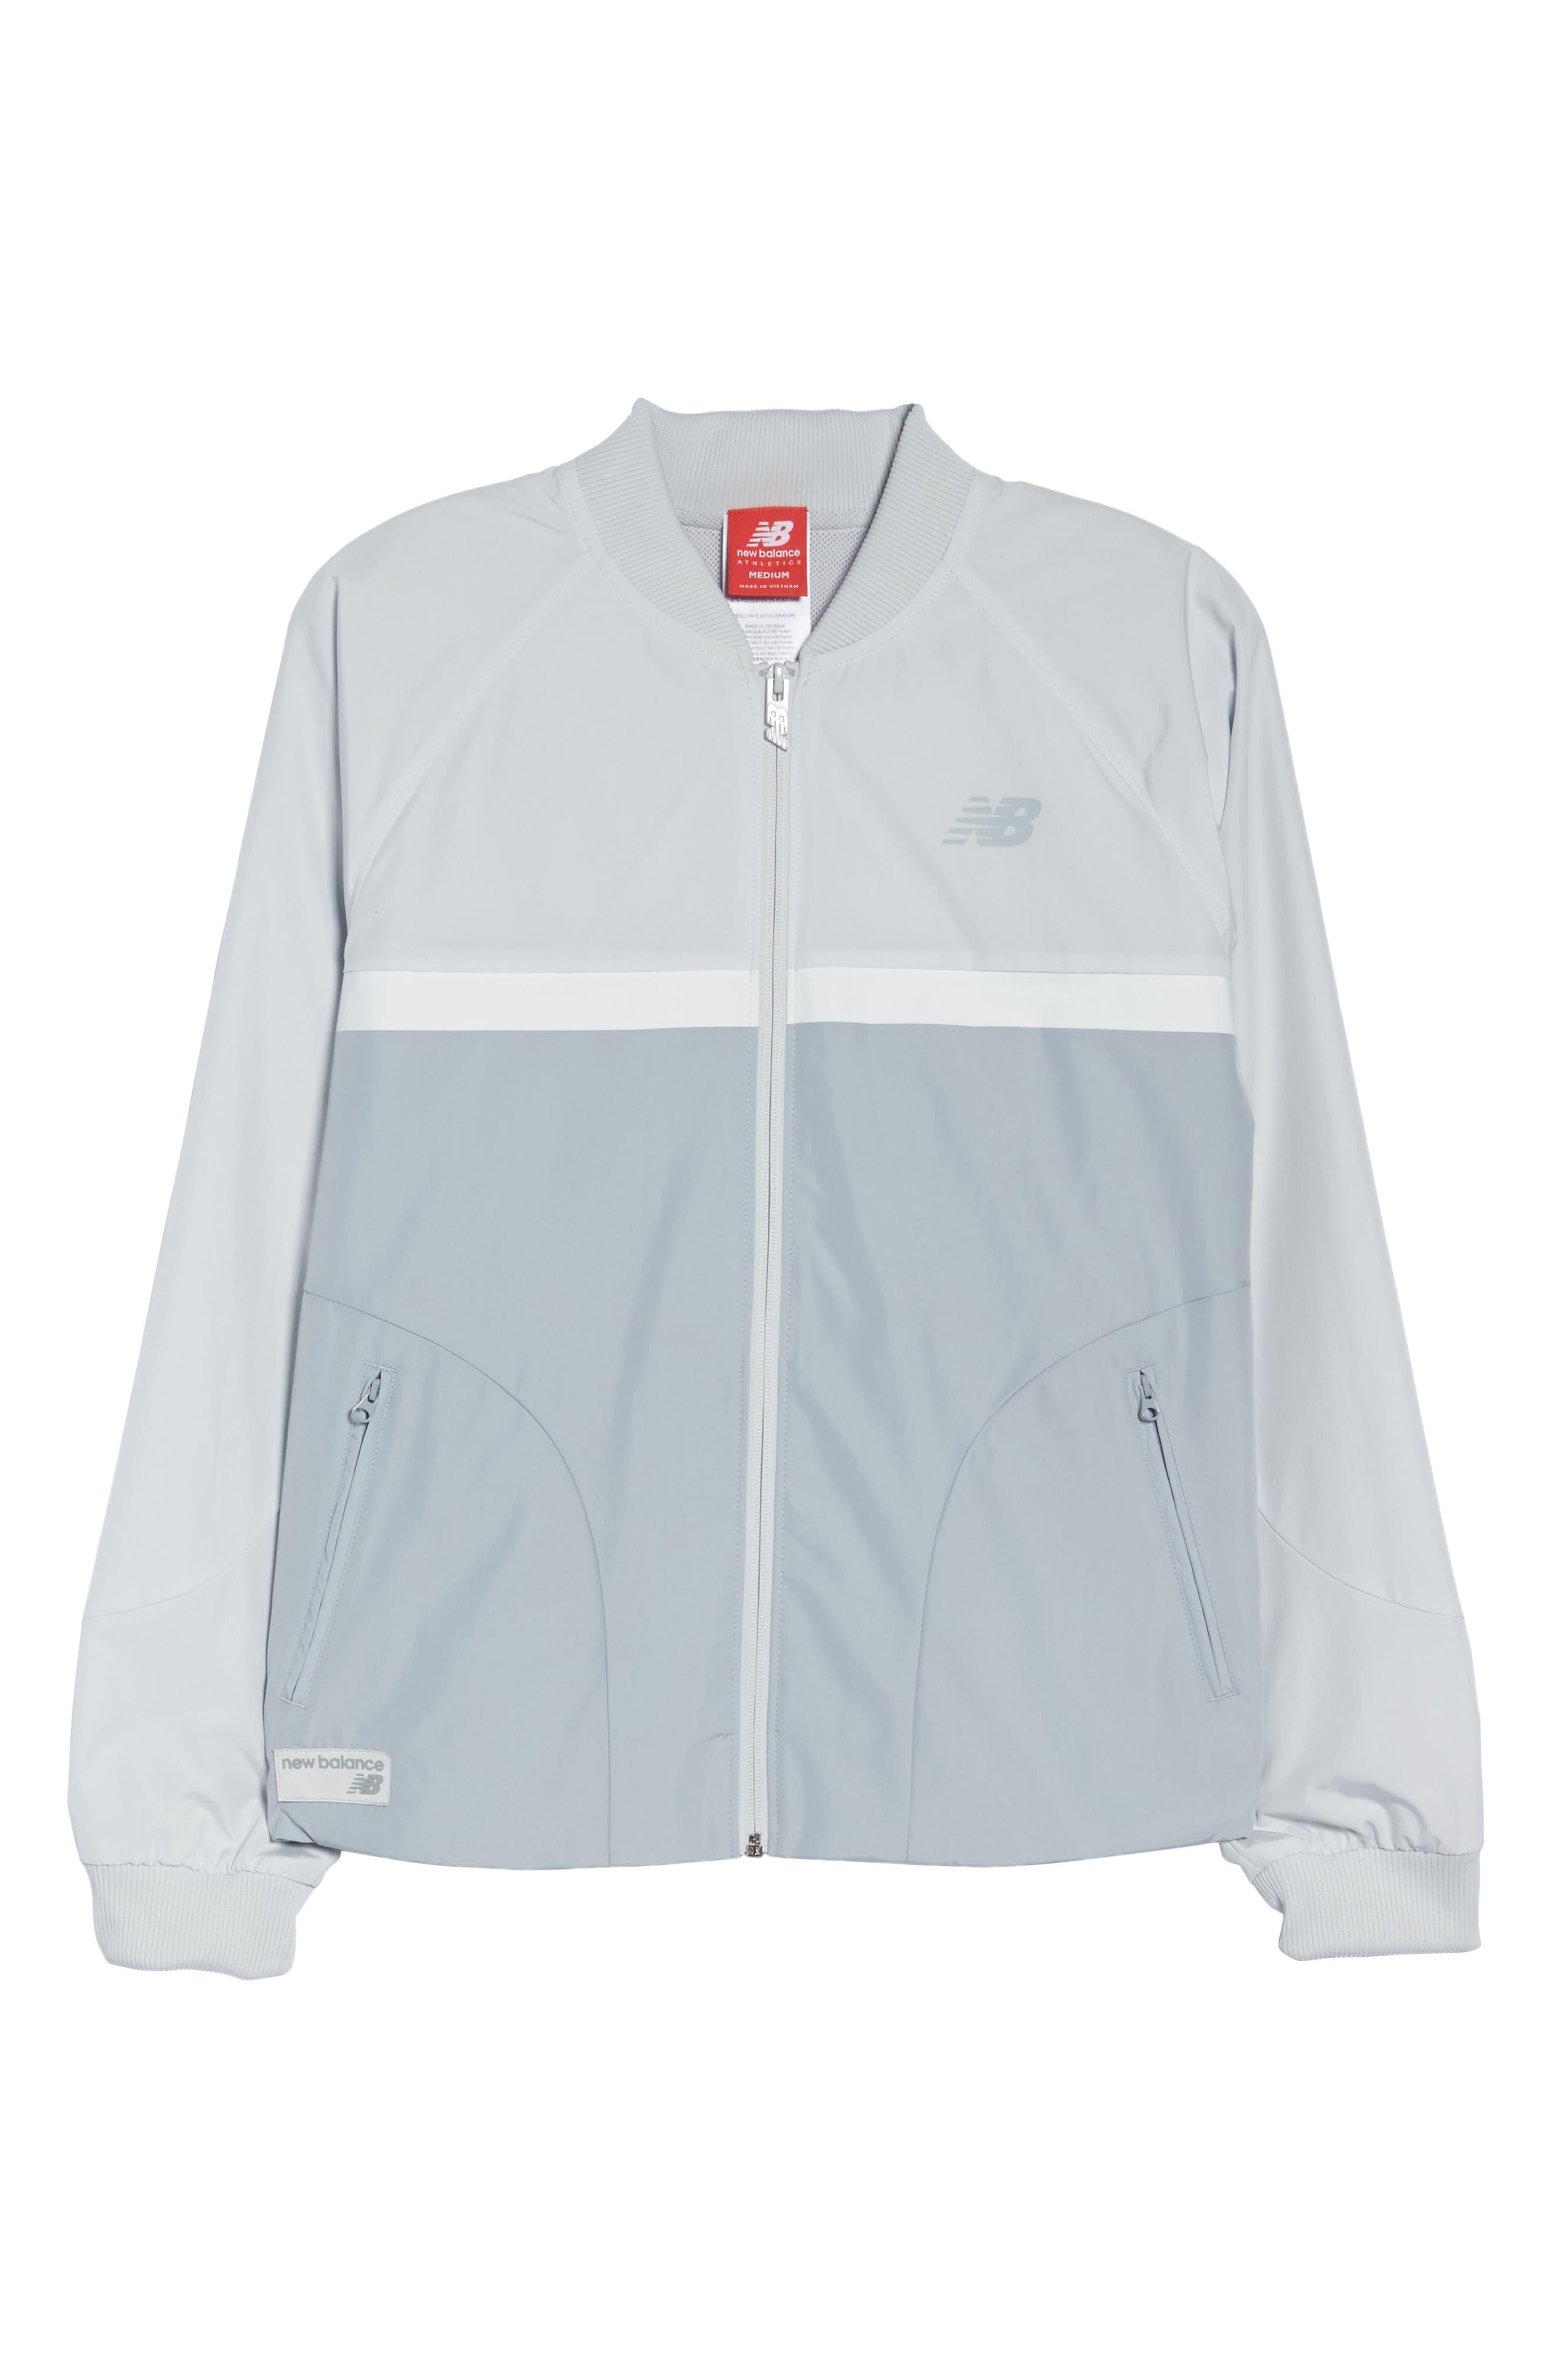 Windbreaker Jacket,                             Alternate thumbnail 5, color,